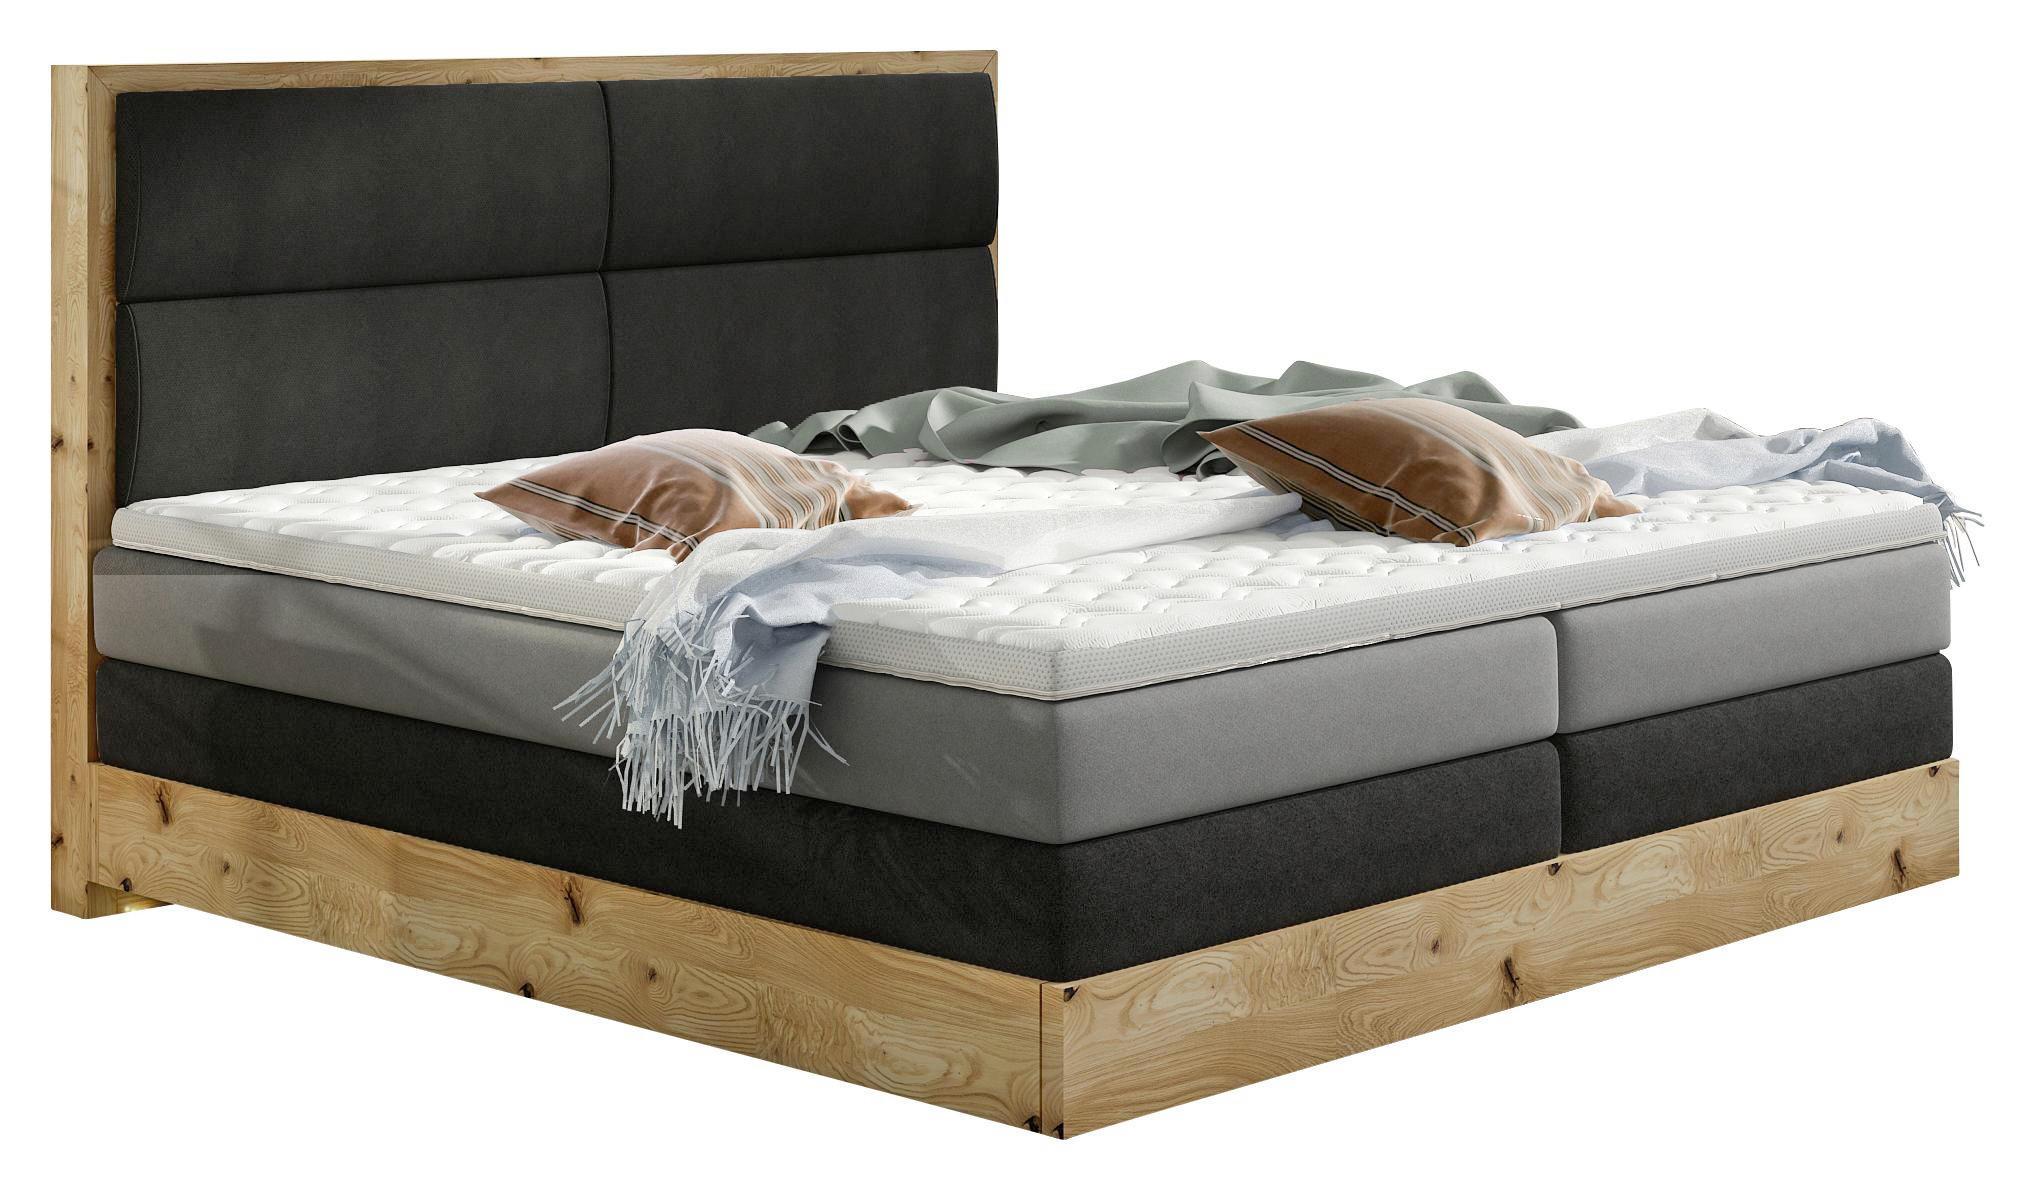 Boxspringbett holz  BOXSPRINGBETT 180 cm x 200 cm in Holz, Textil Dunkelgrau ...